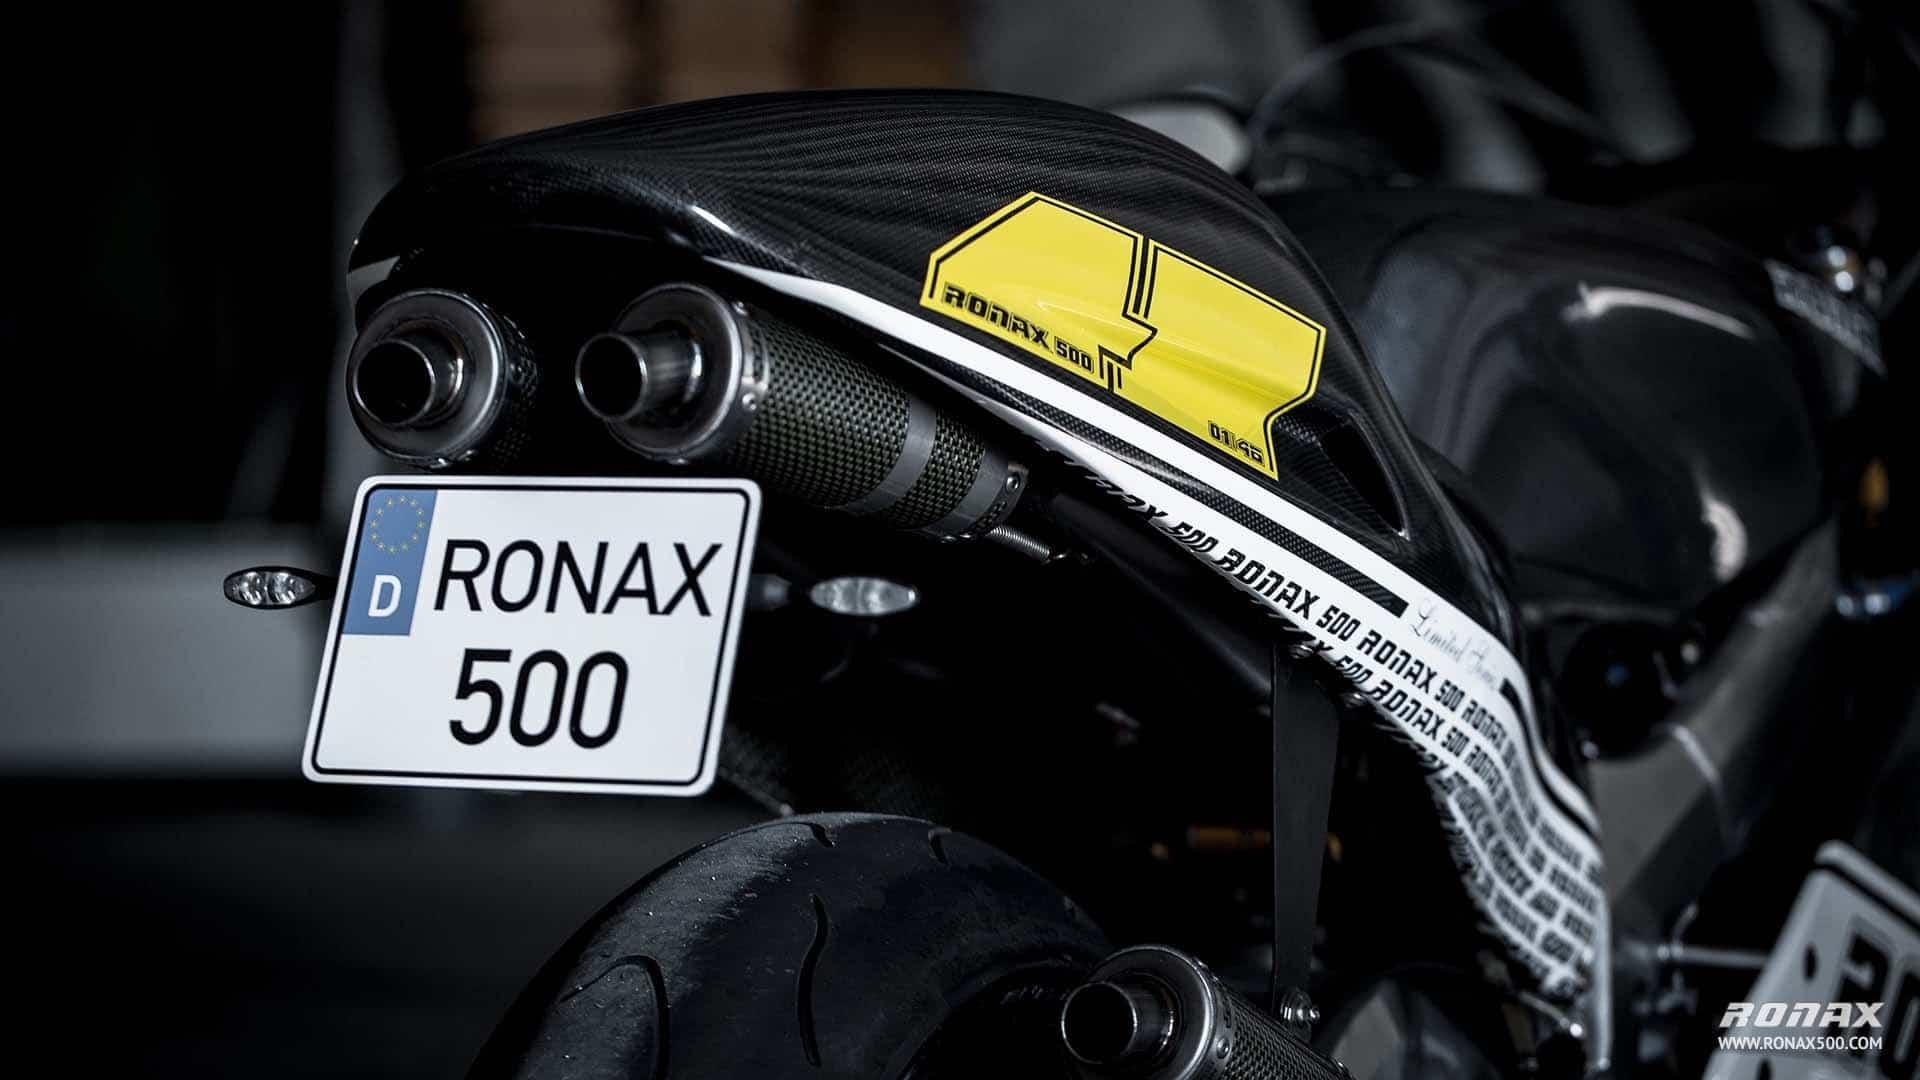 Ronax-500-Motorbike 9